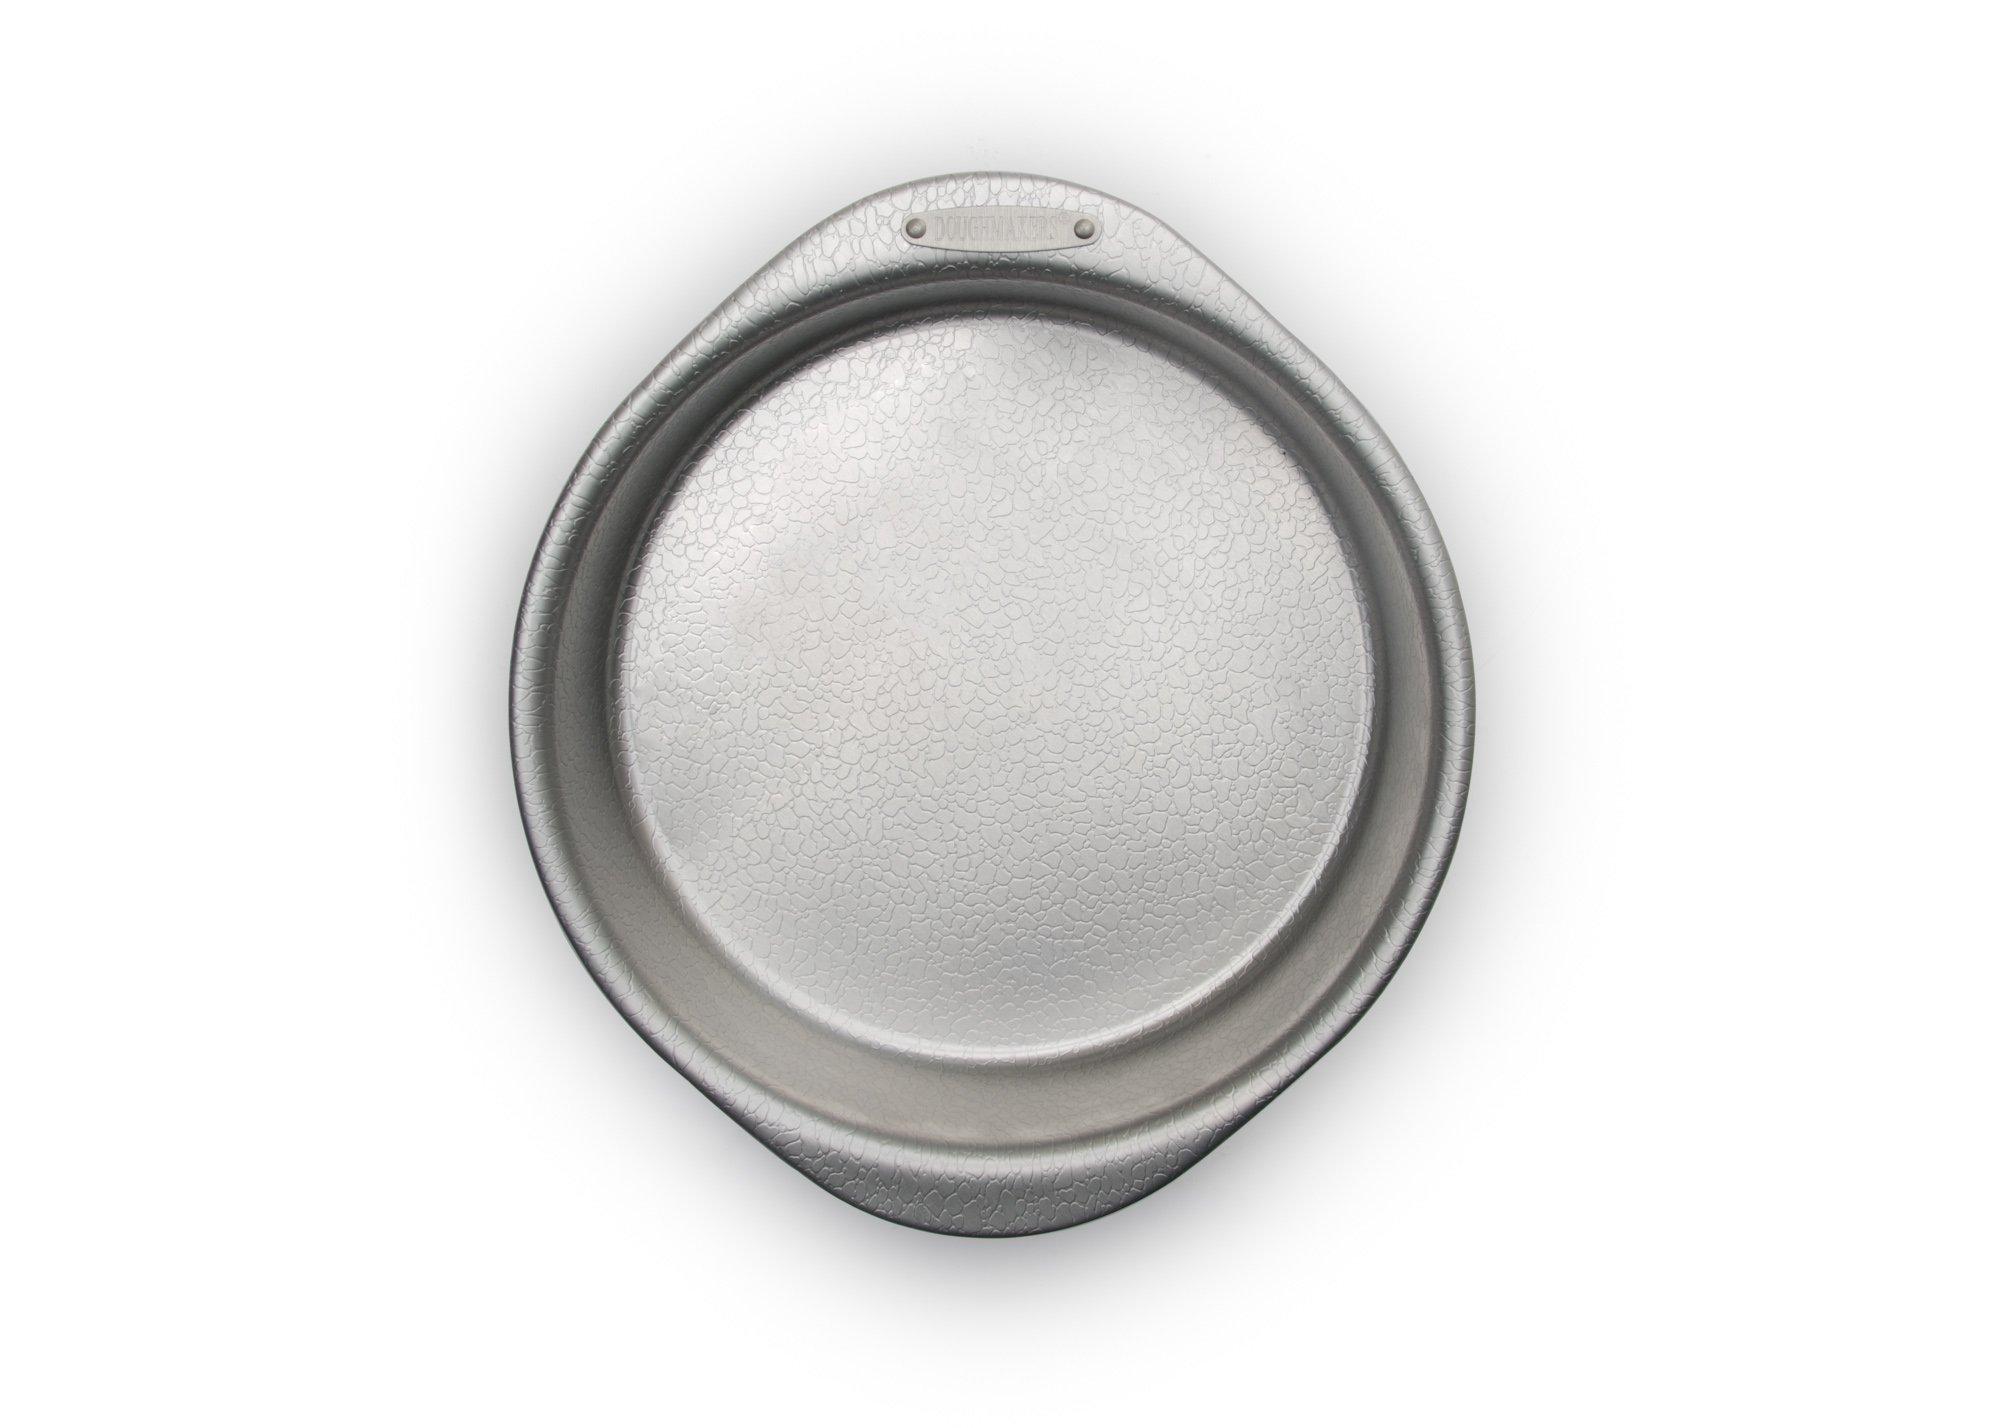 Doughmakers 10221 9'' Round Cake Commercial Grade Aluminum Bake Pan